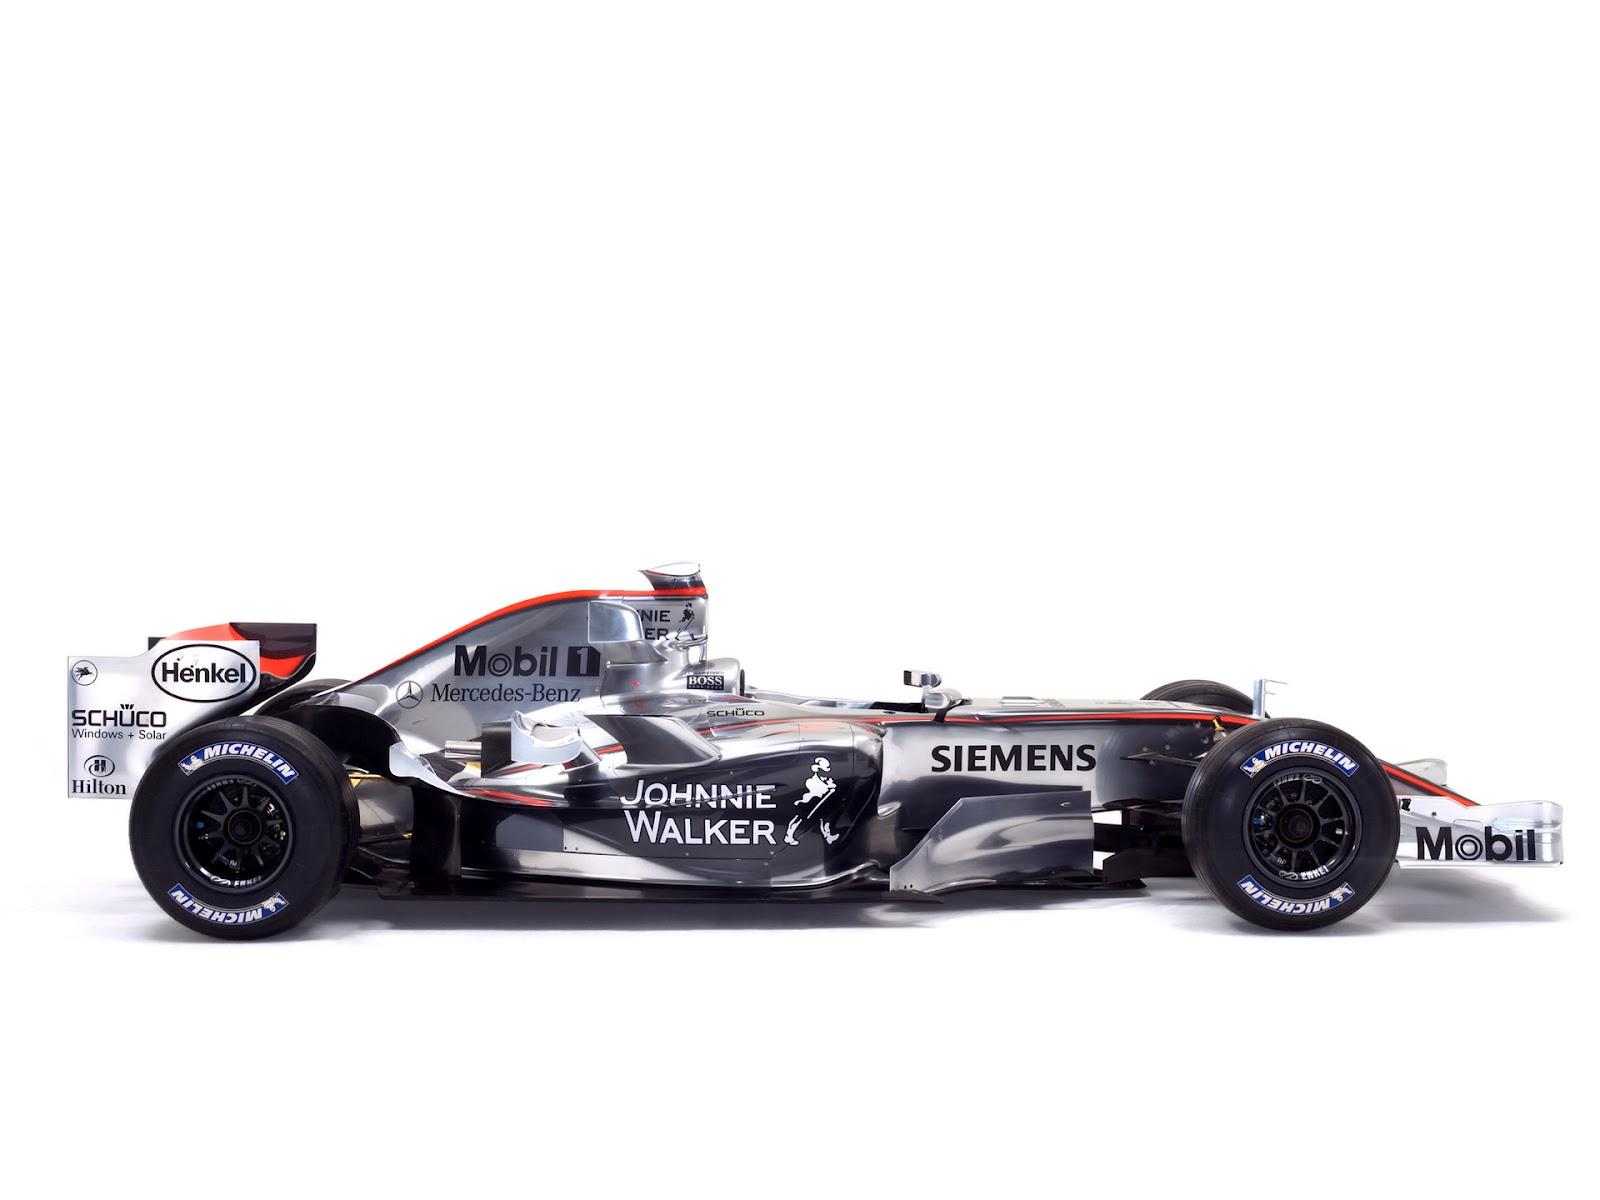 Latest mclaren mercedes benz f1 cars cool photos 521 for Mercedes benz f1 car